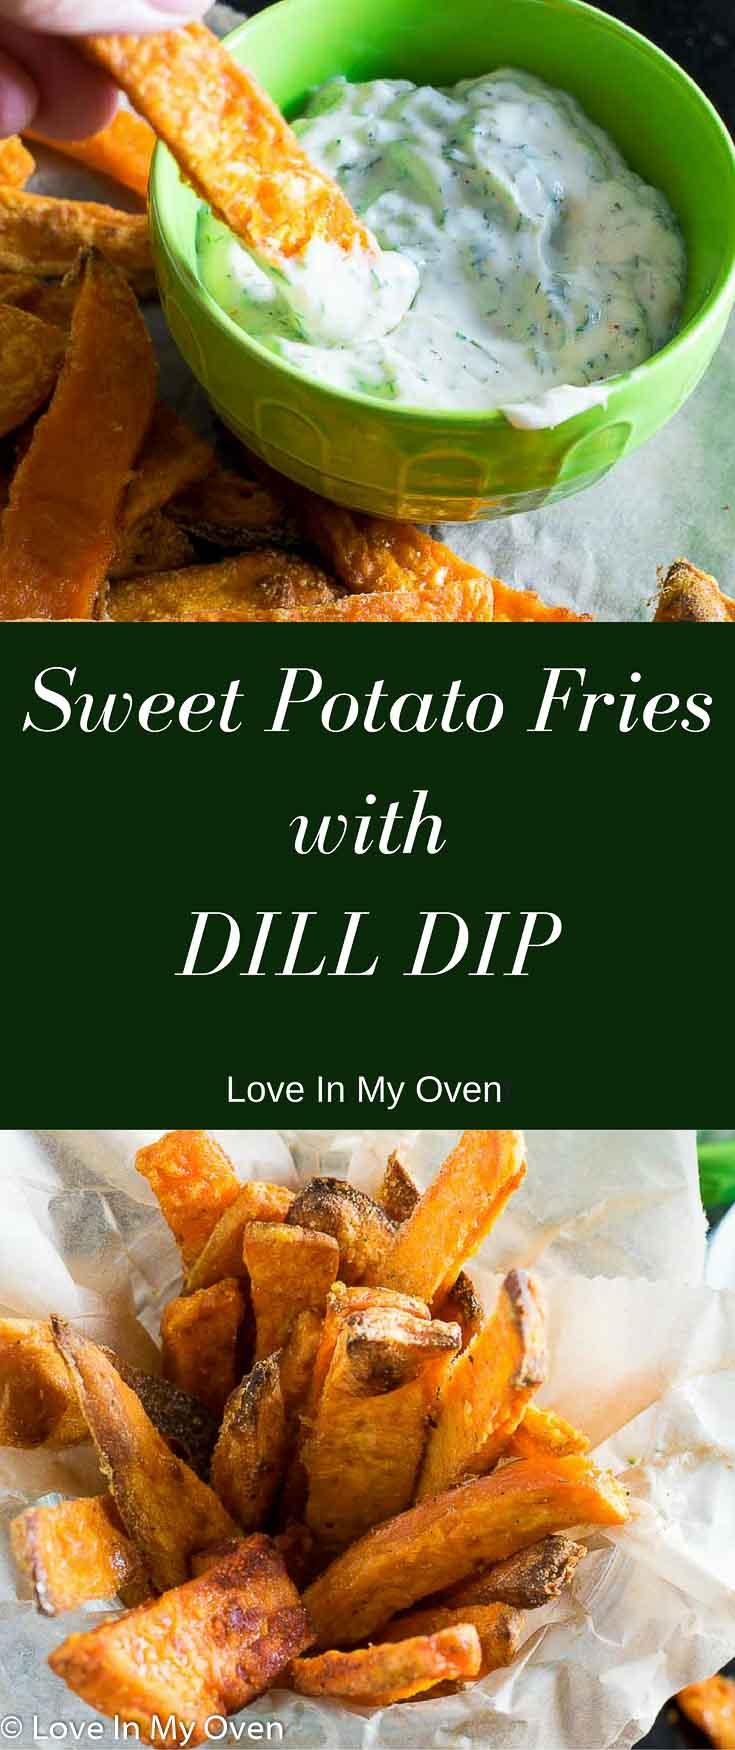 sweet potato fries, dill dip, crispy fries, on the side, appetizer, sweet potato